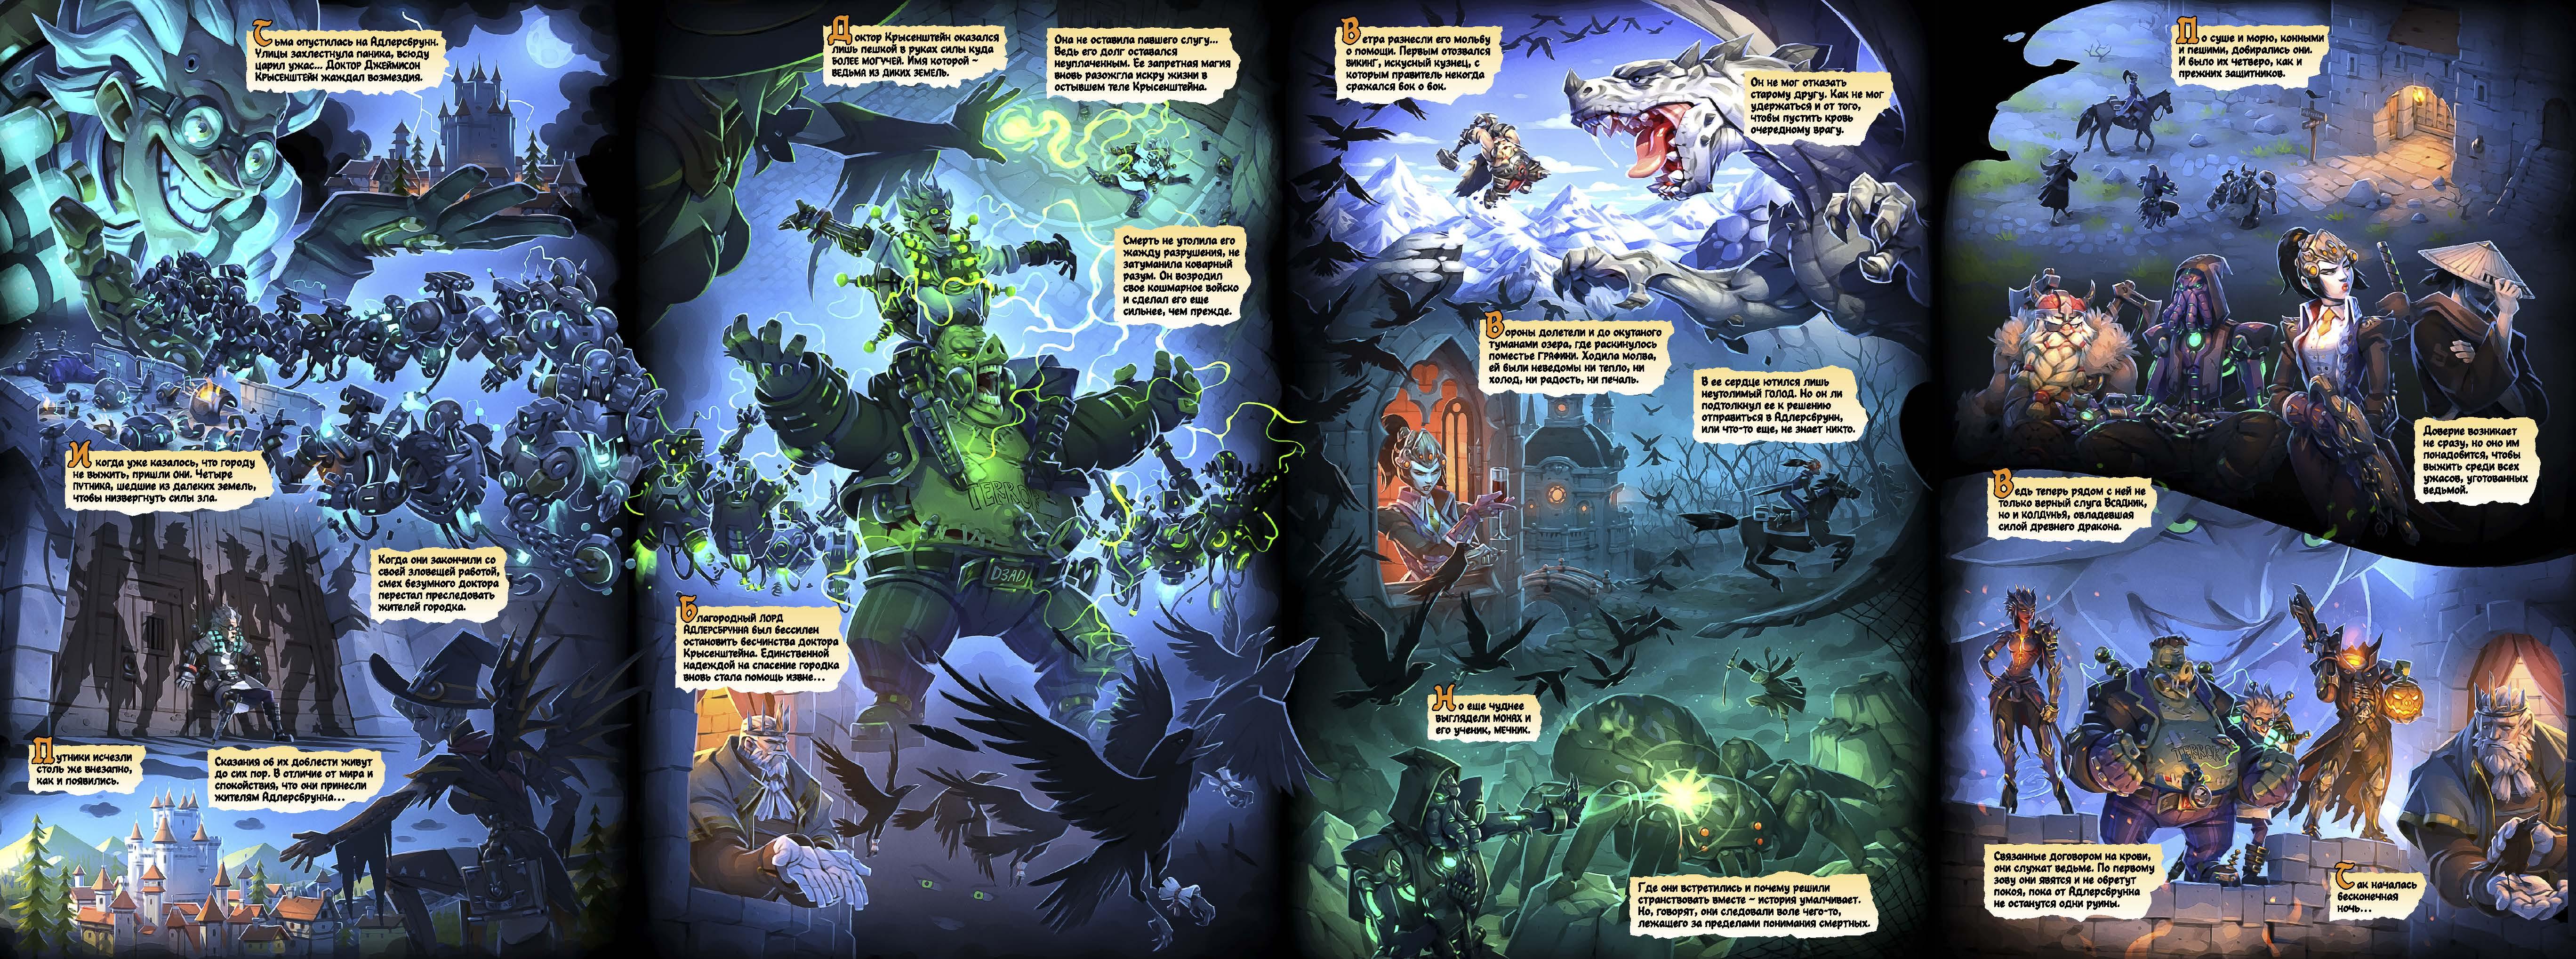 Overwatch. Halloween Terror Tapestry - Overwatch comics, story, арт, история, комикс, Хеллоуин